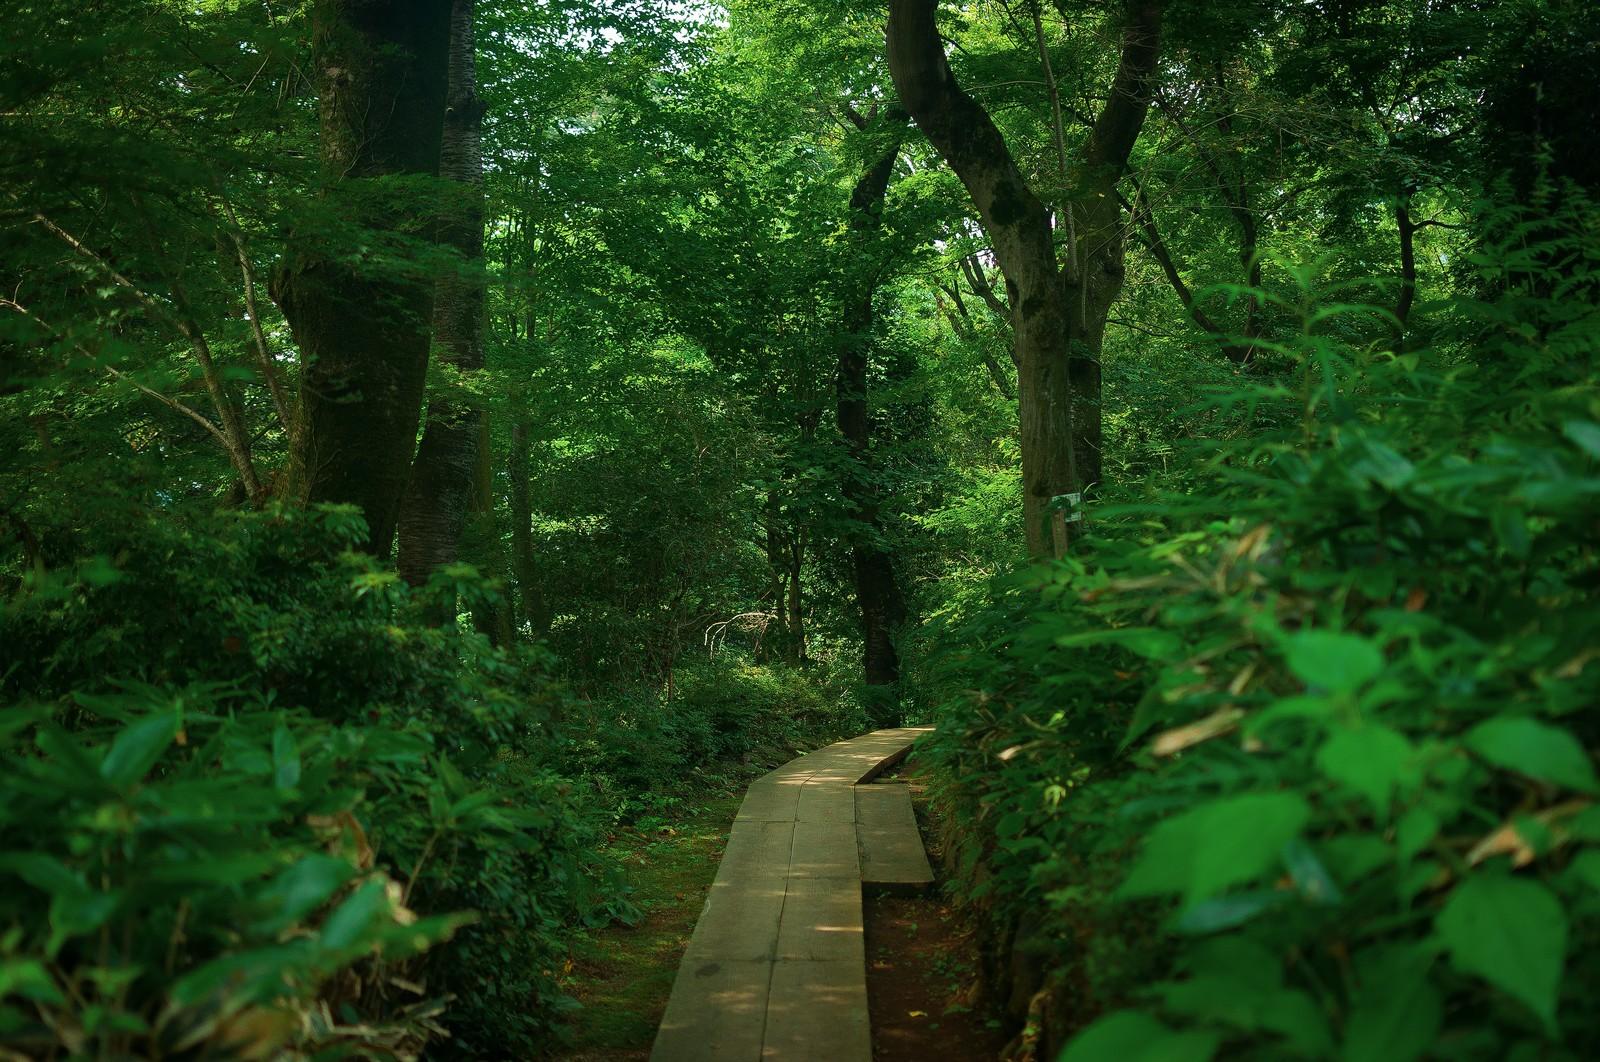 《WMD企画その2》5/27(土)ワールドメラノーマデー:チャリティーハイキング 〜新緑の高尾山を歩こう〜